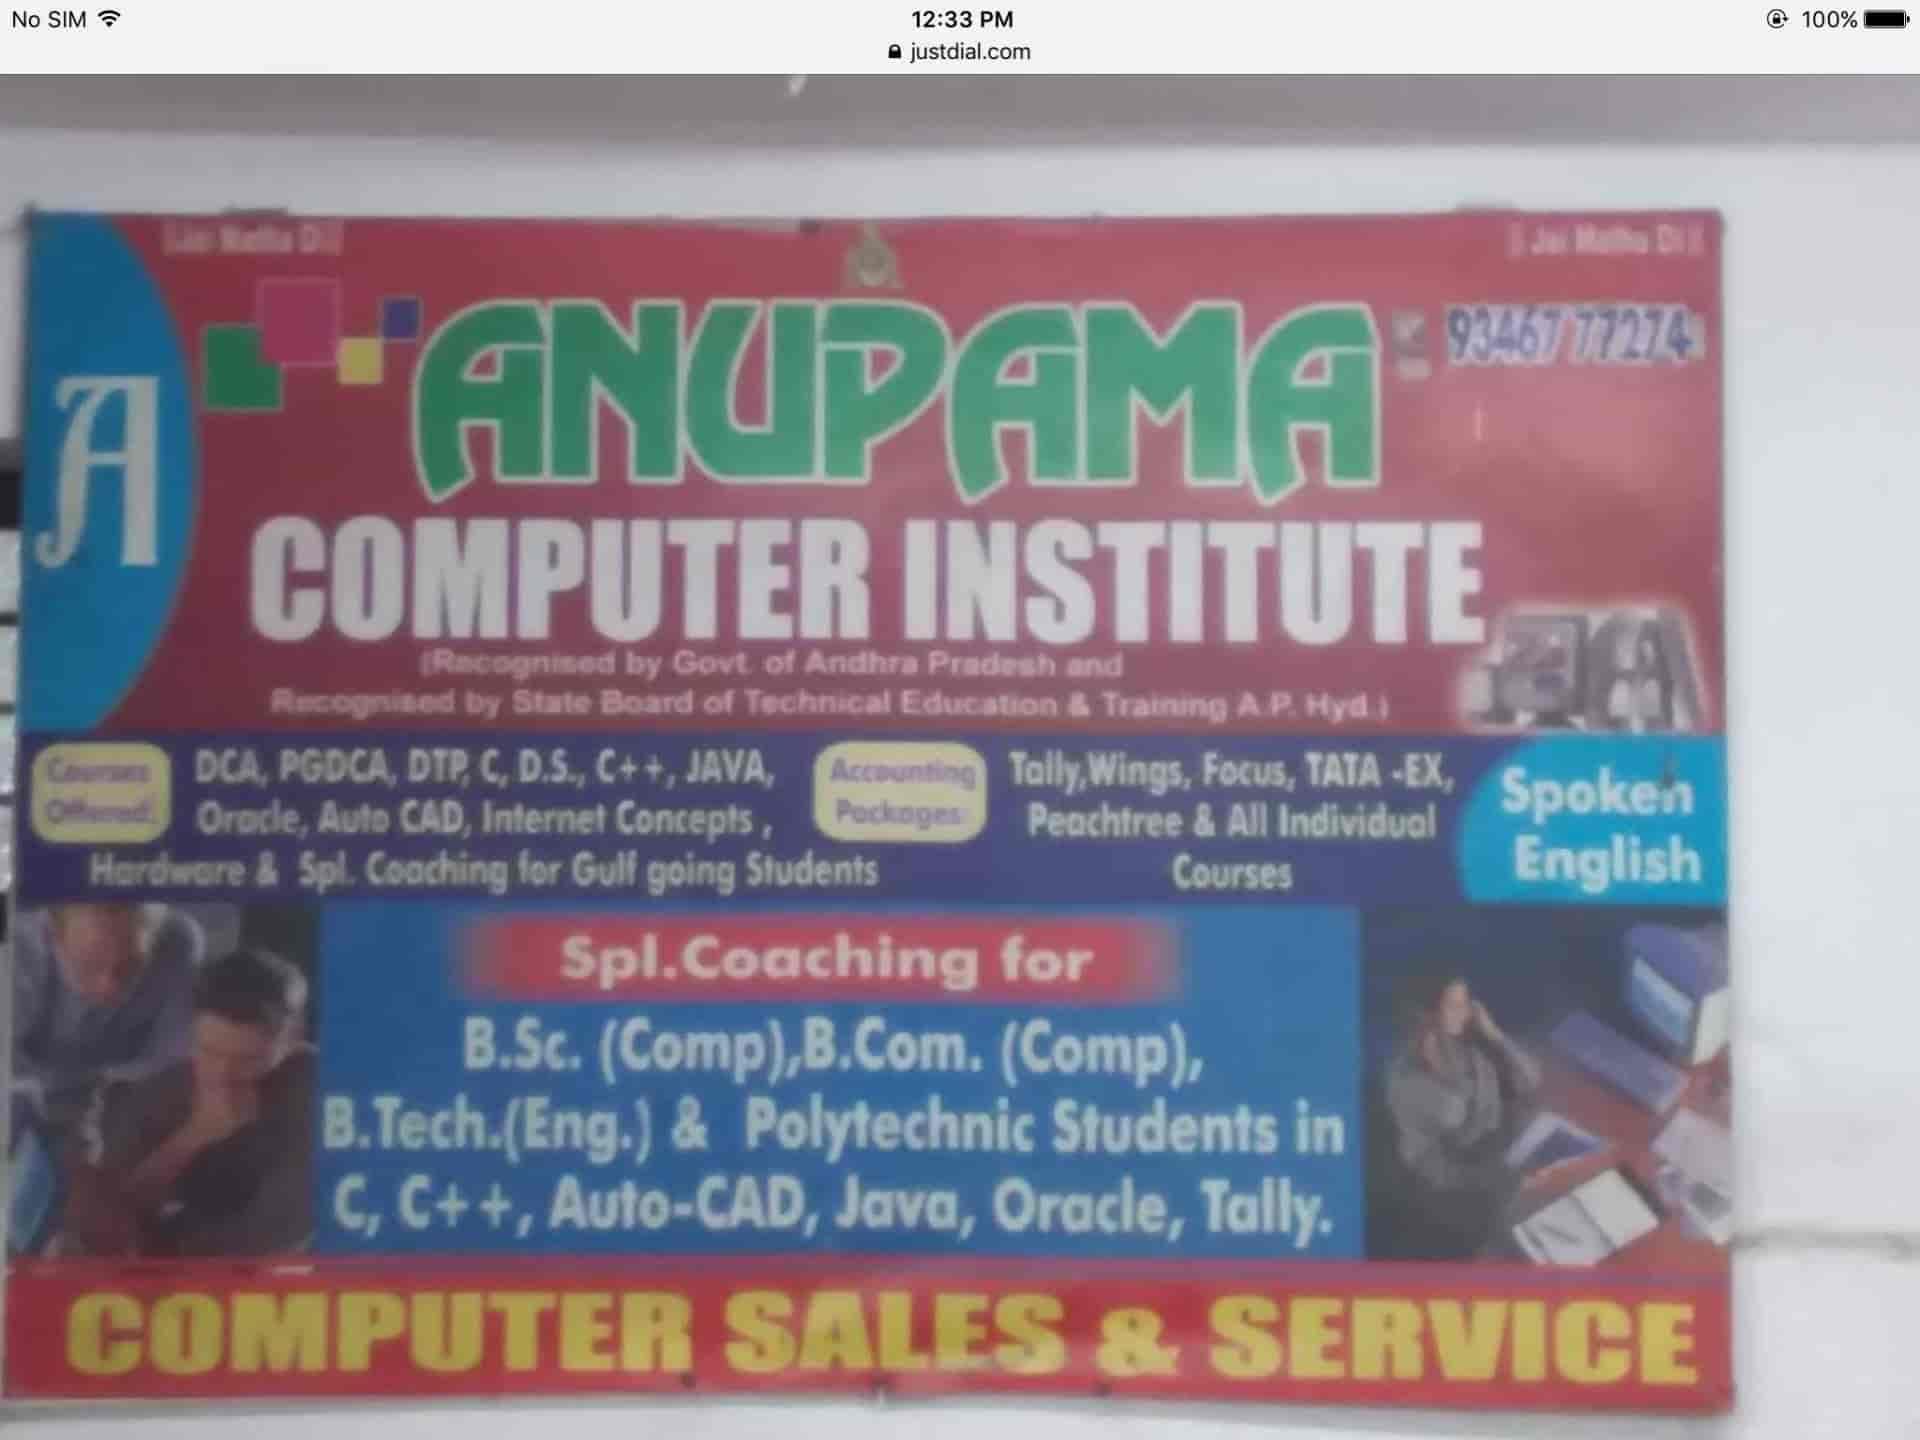 Anupama Type Writing Center Photos, Shivaji Nagar, Nizamabad